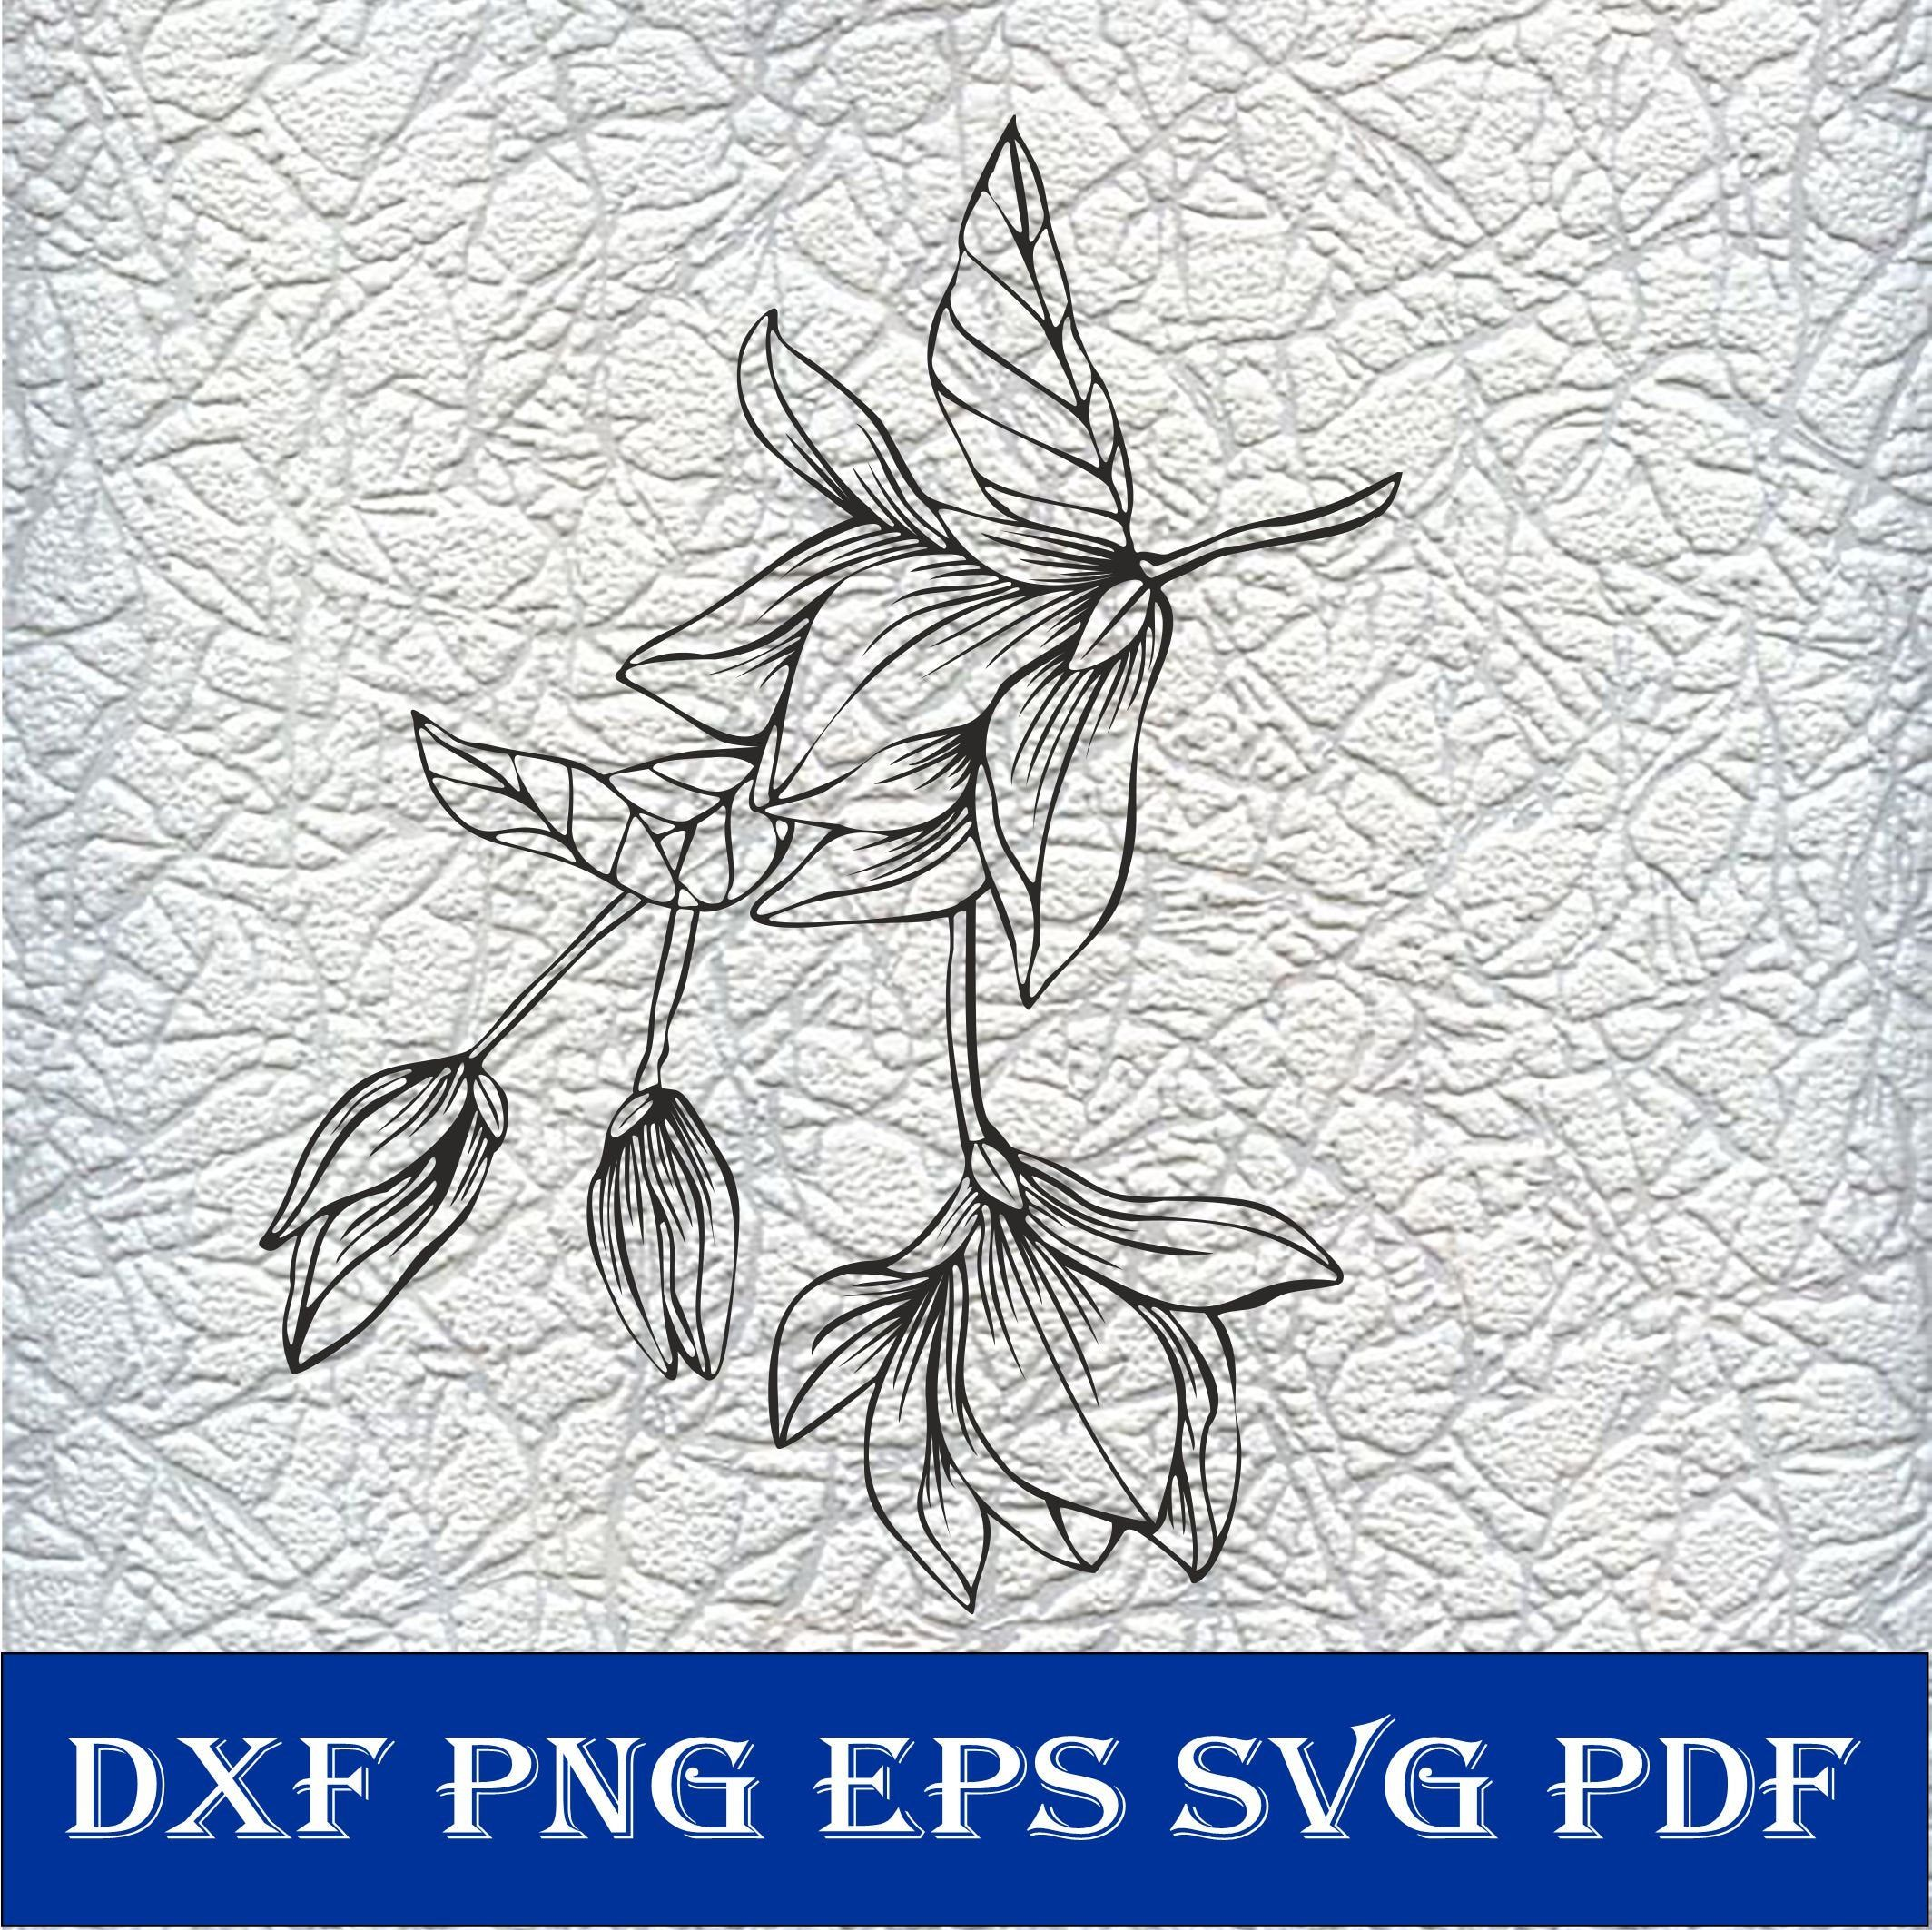 Pin on SVG PDF DXF